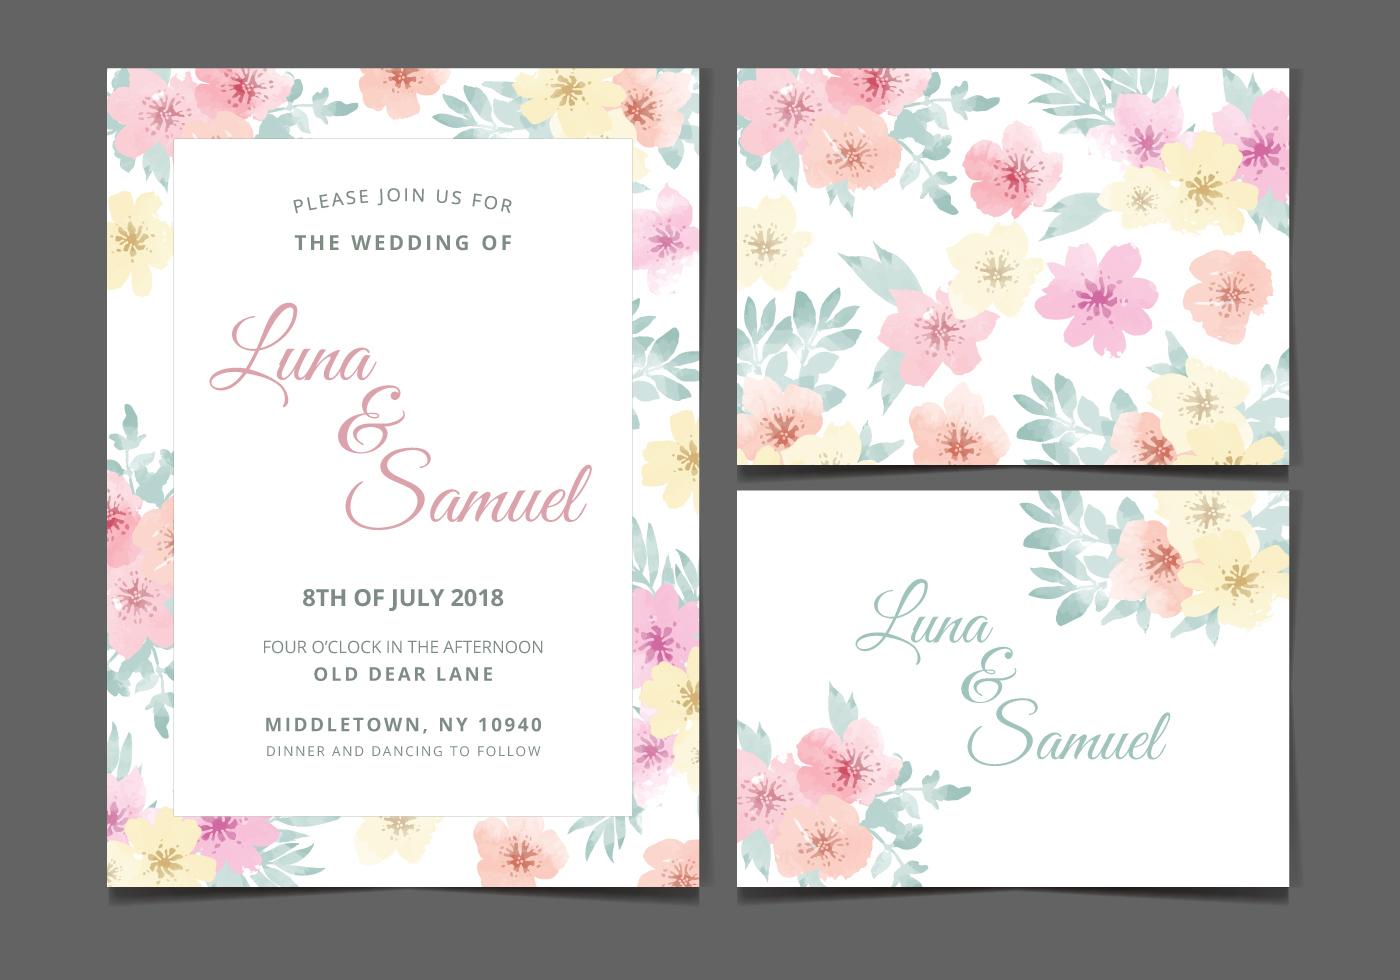 vector watercolor flower wedding invite download free vector art stock graphics images. Black Bedroom Furniture Sets. Home Design Ideas